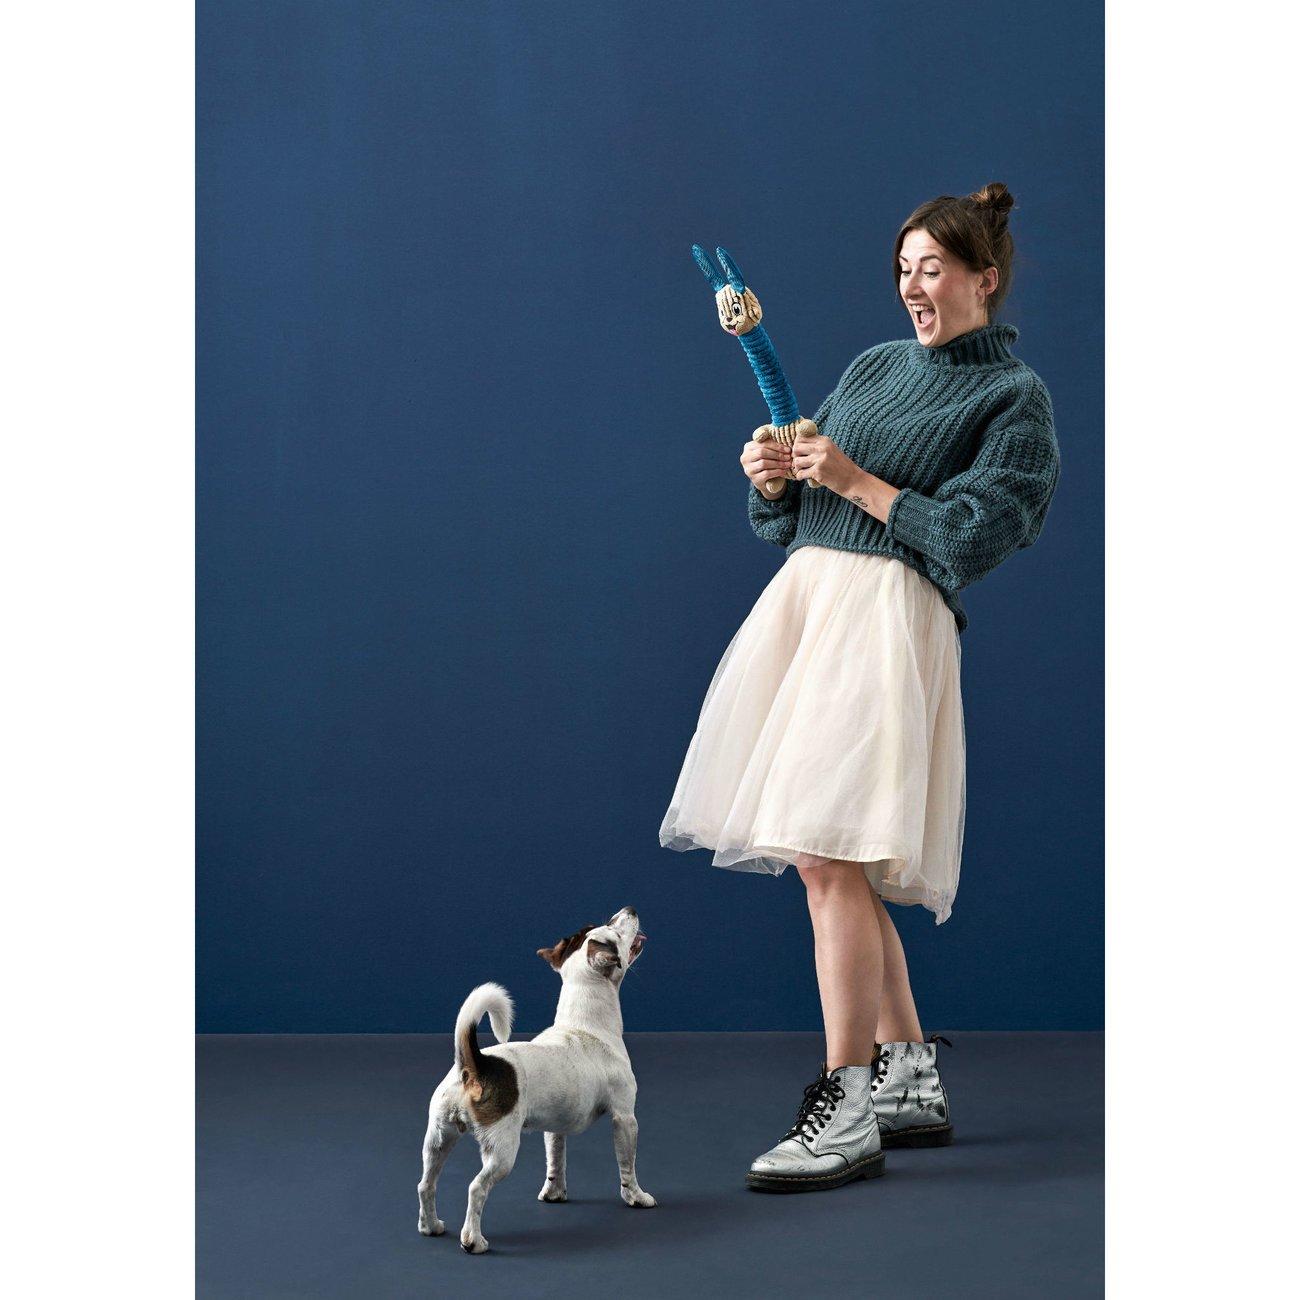 Hunter Hundespielzeug Granby 67452, Bild 5